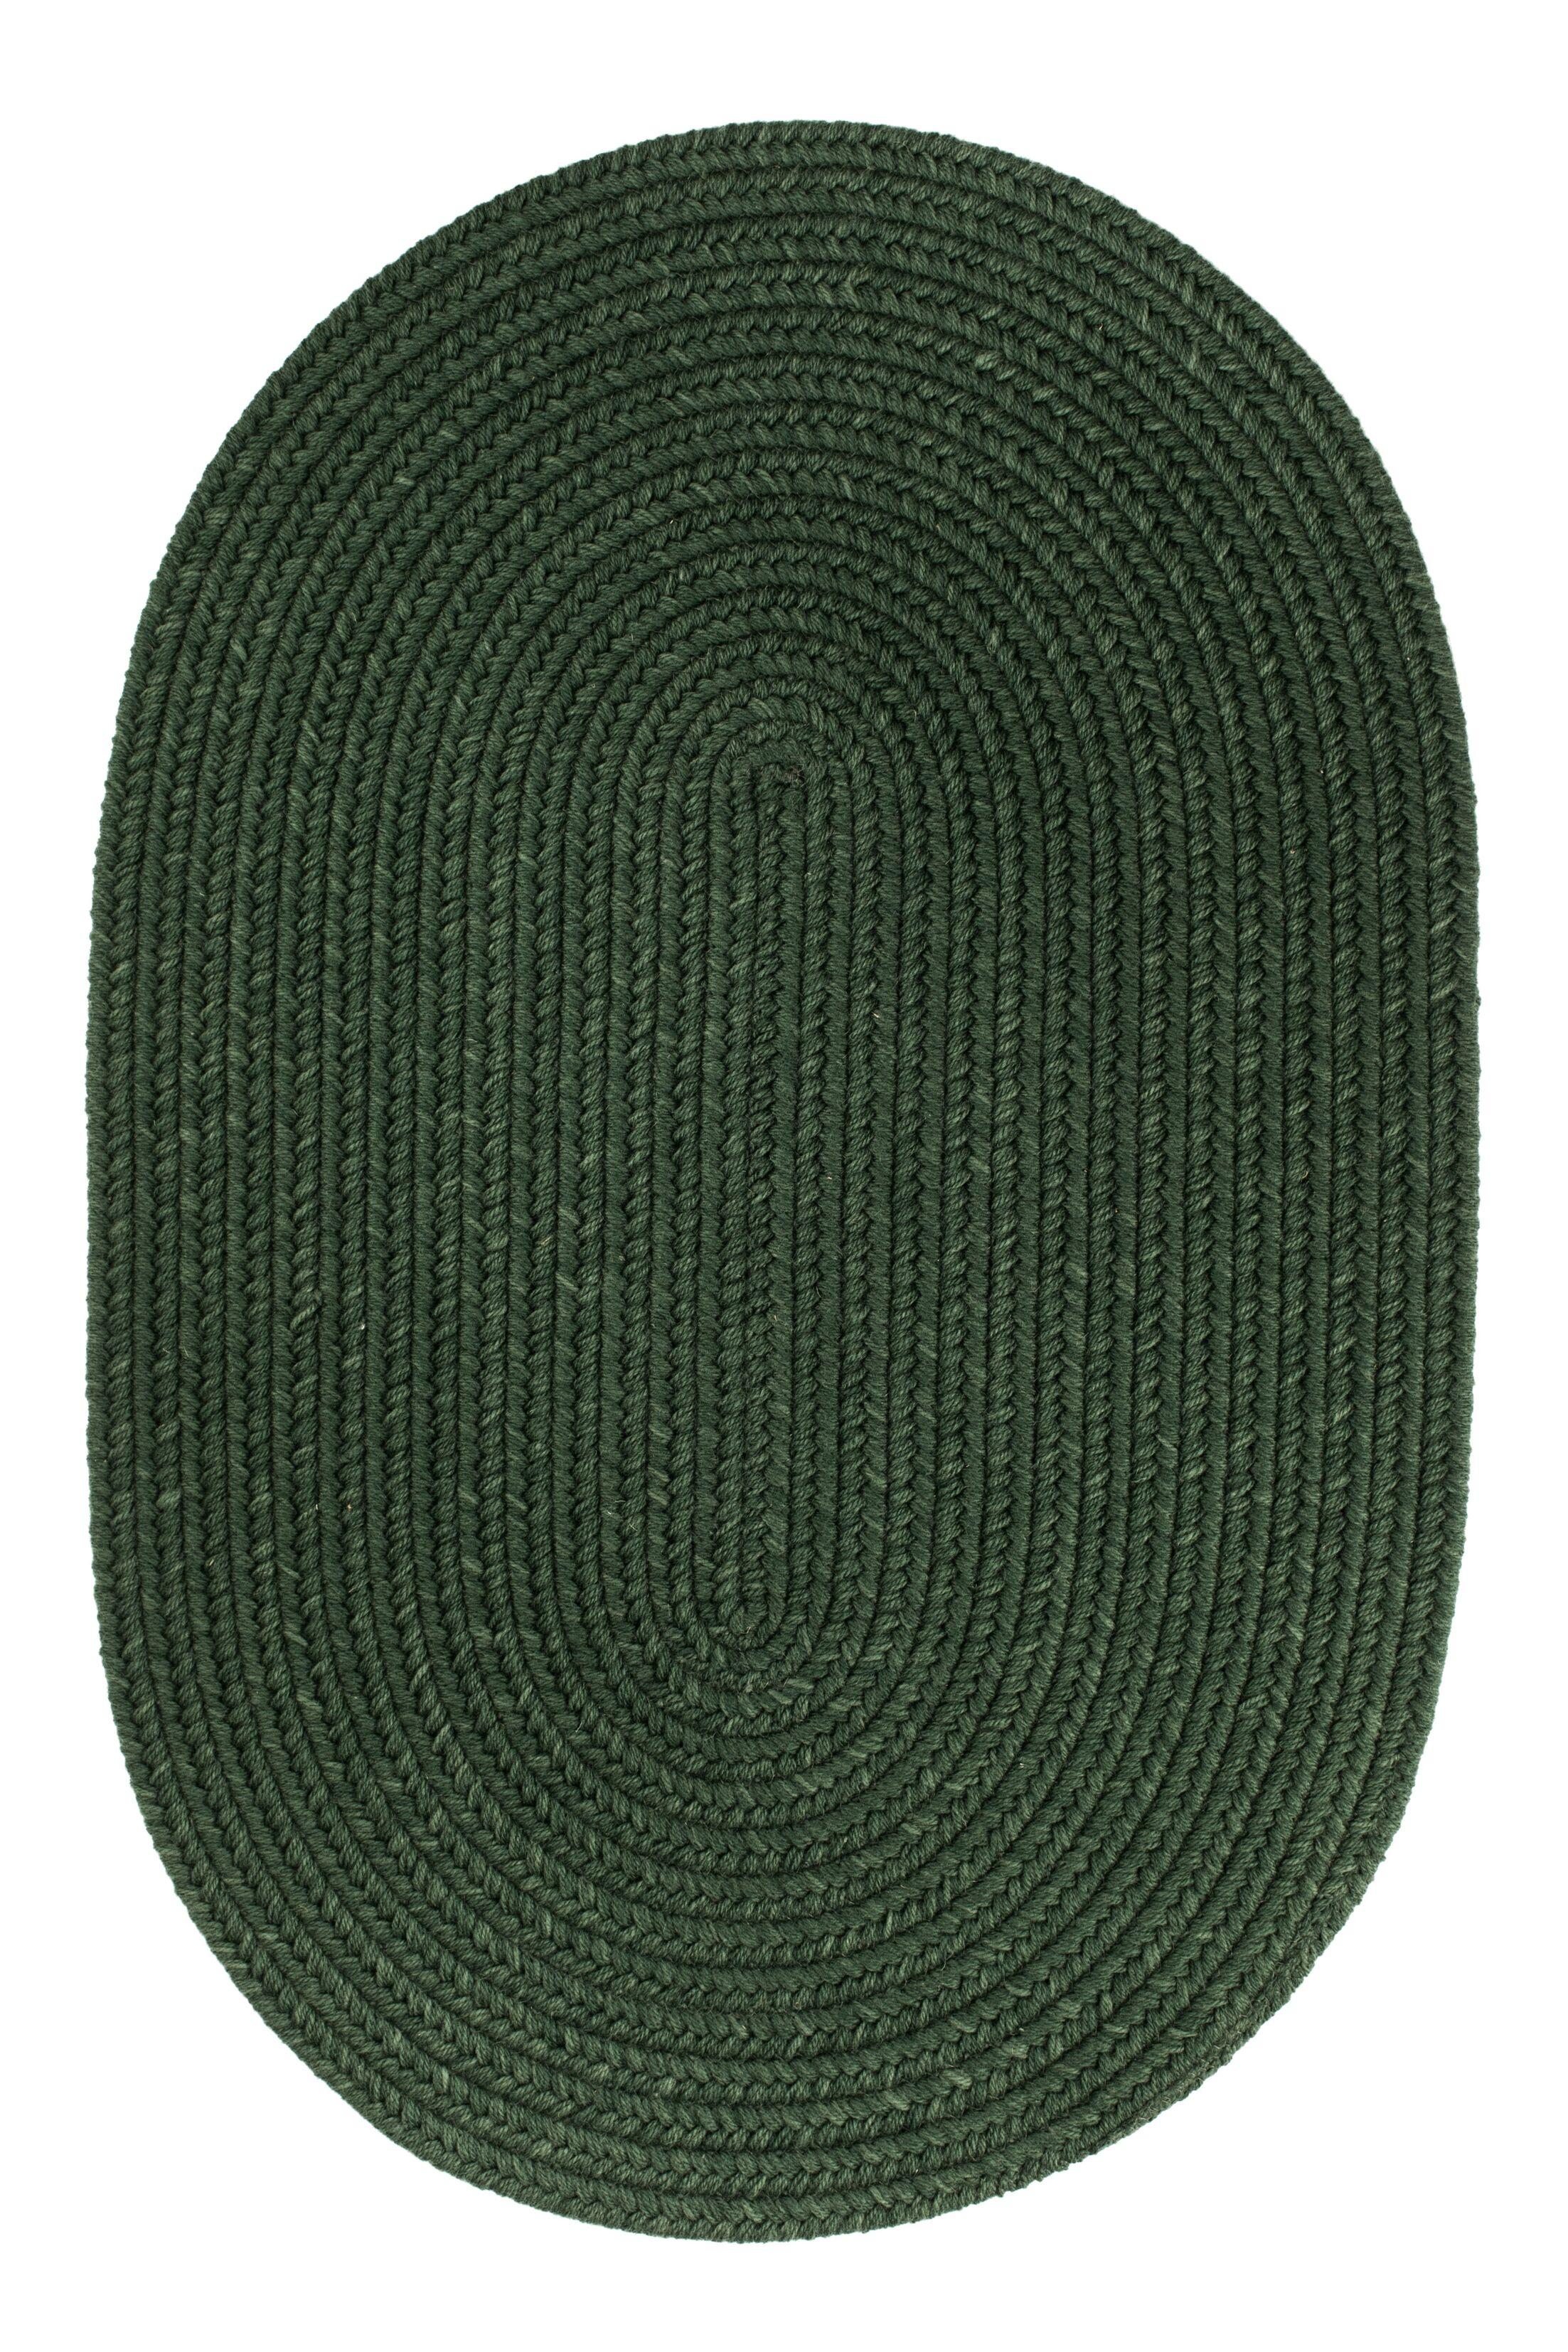 Handmade Hunter Green Area Rug Rug Size: Round 8'